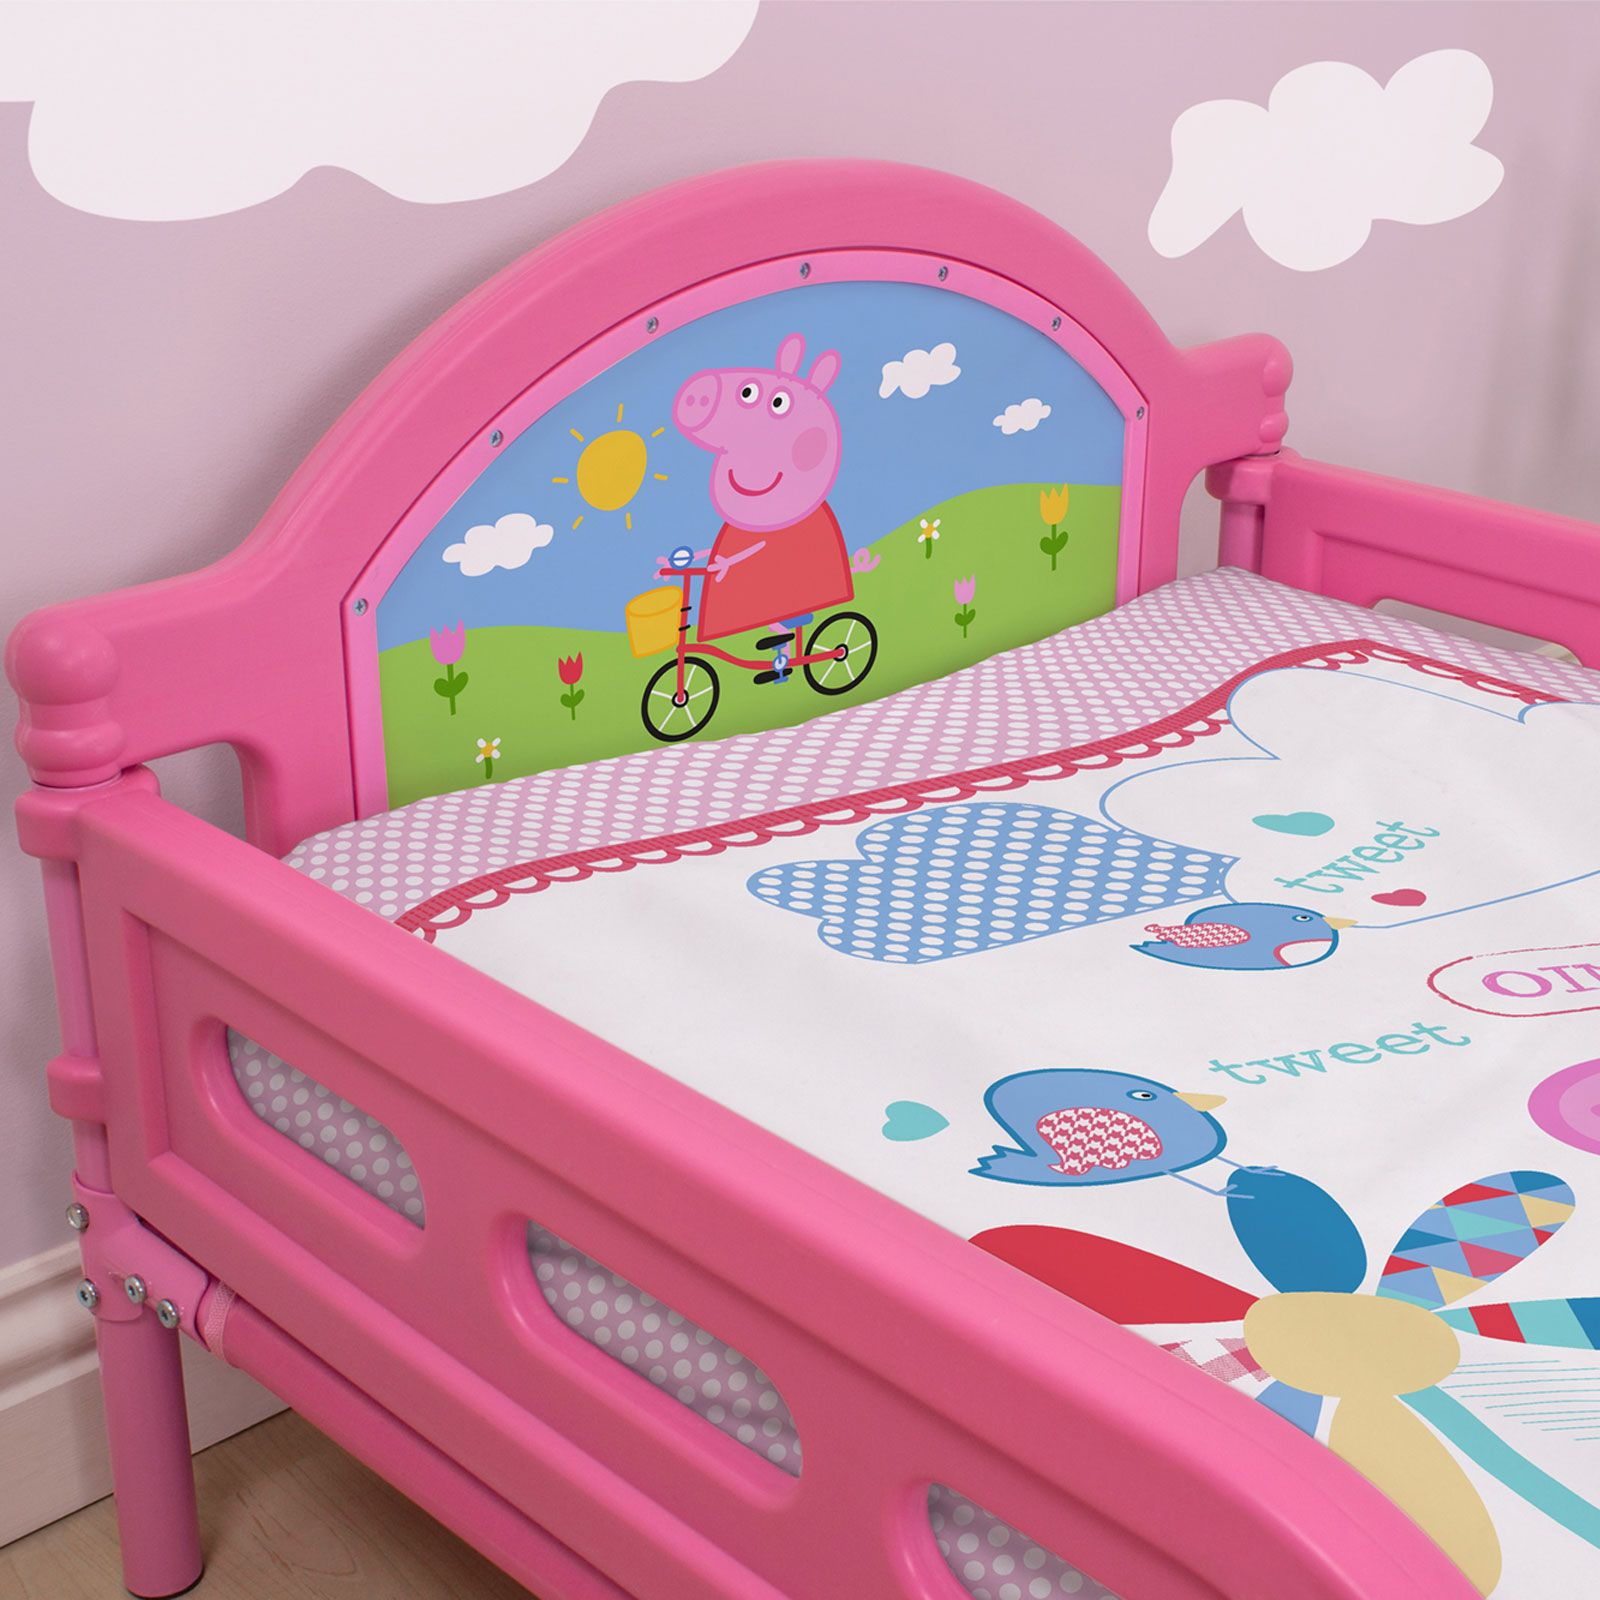 PEPPA PIG 'TULIP' JUNIOR TODDLER BED + MATTRESS NEW ...